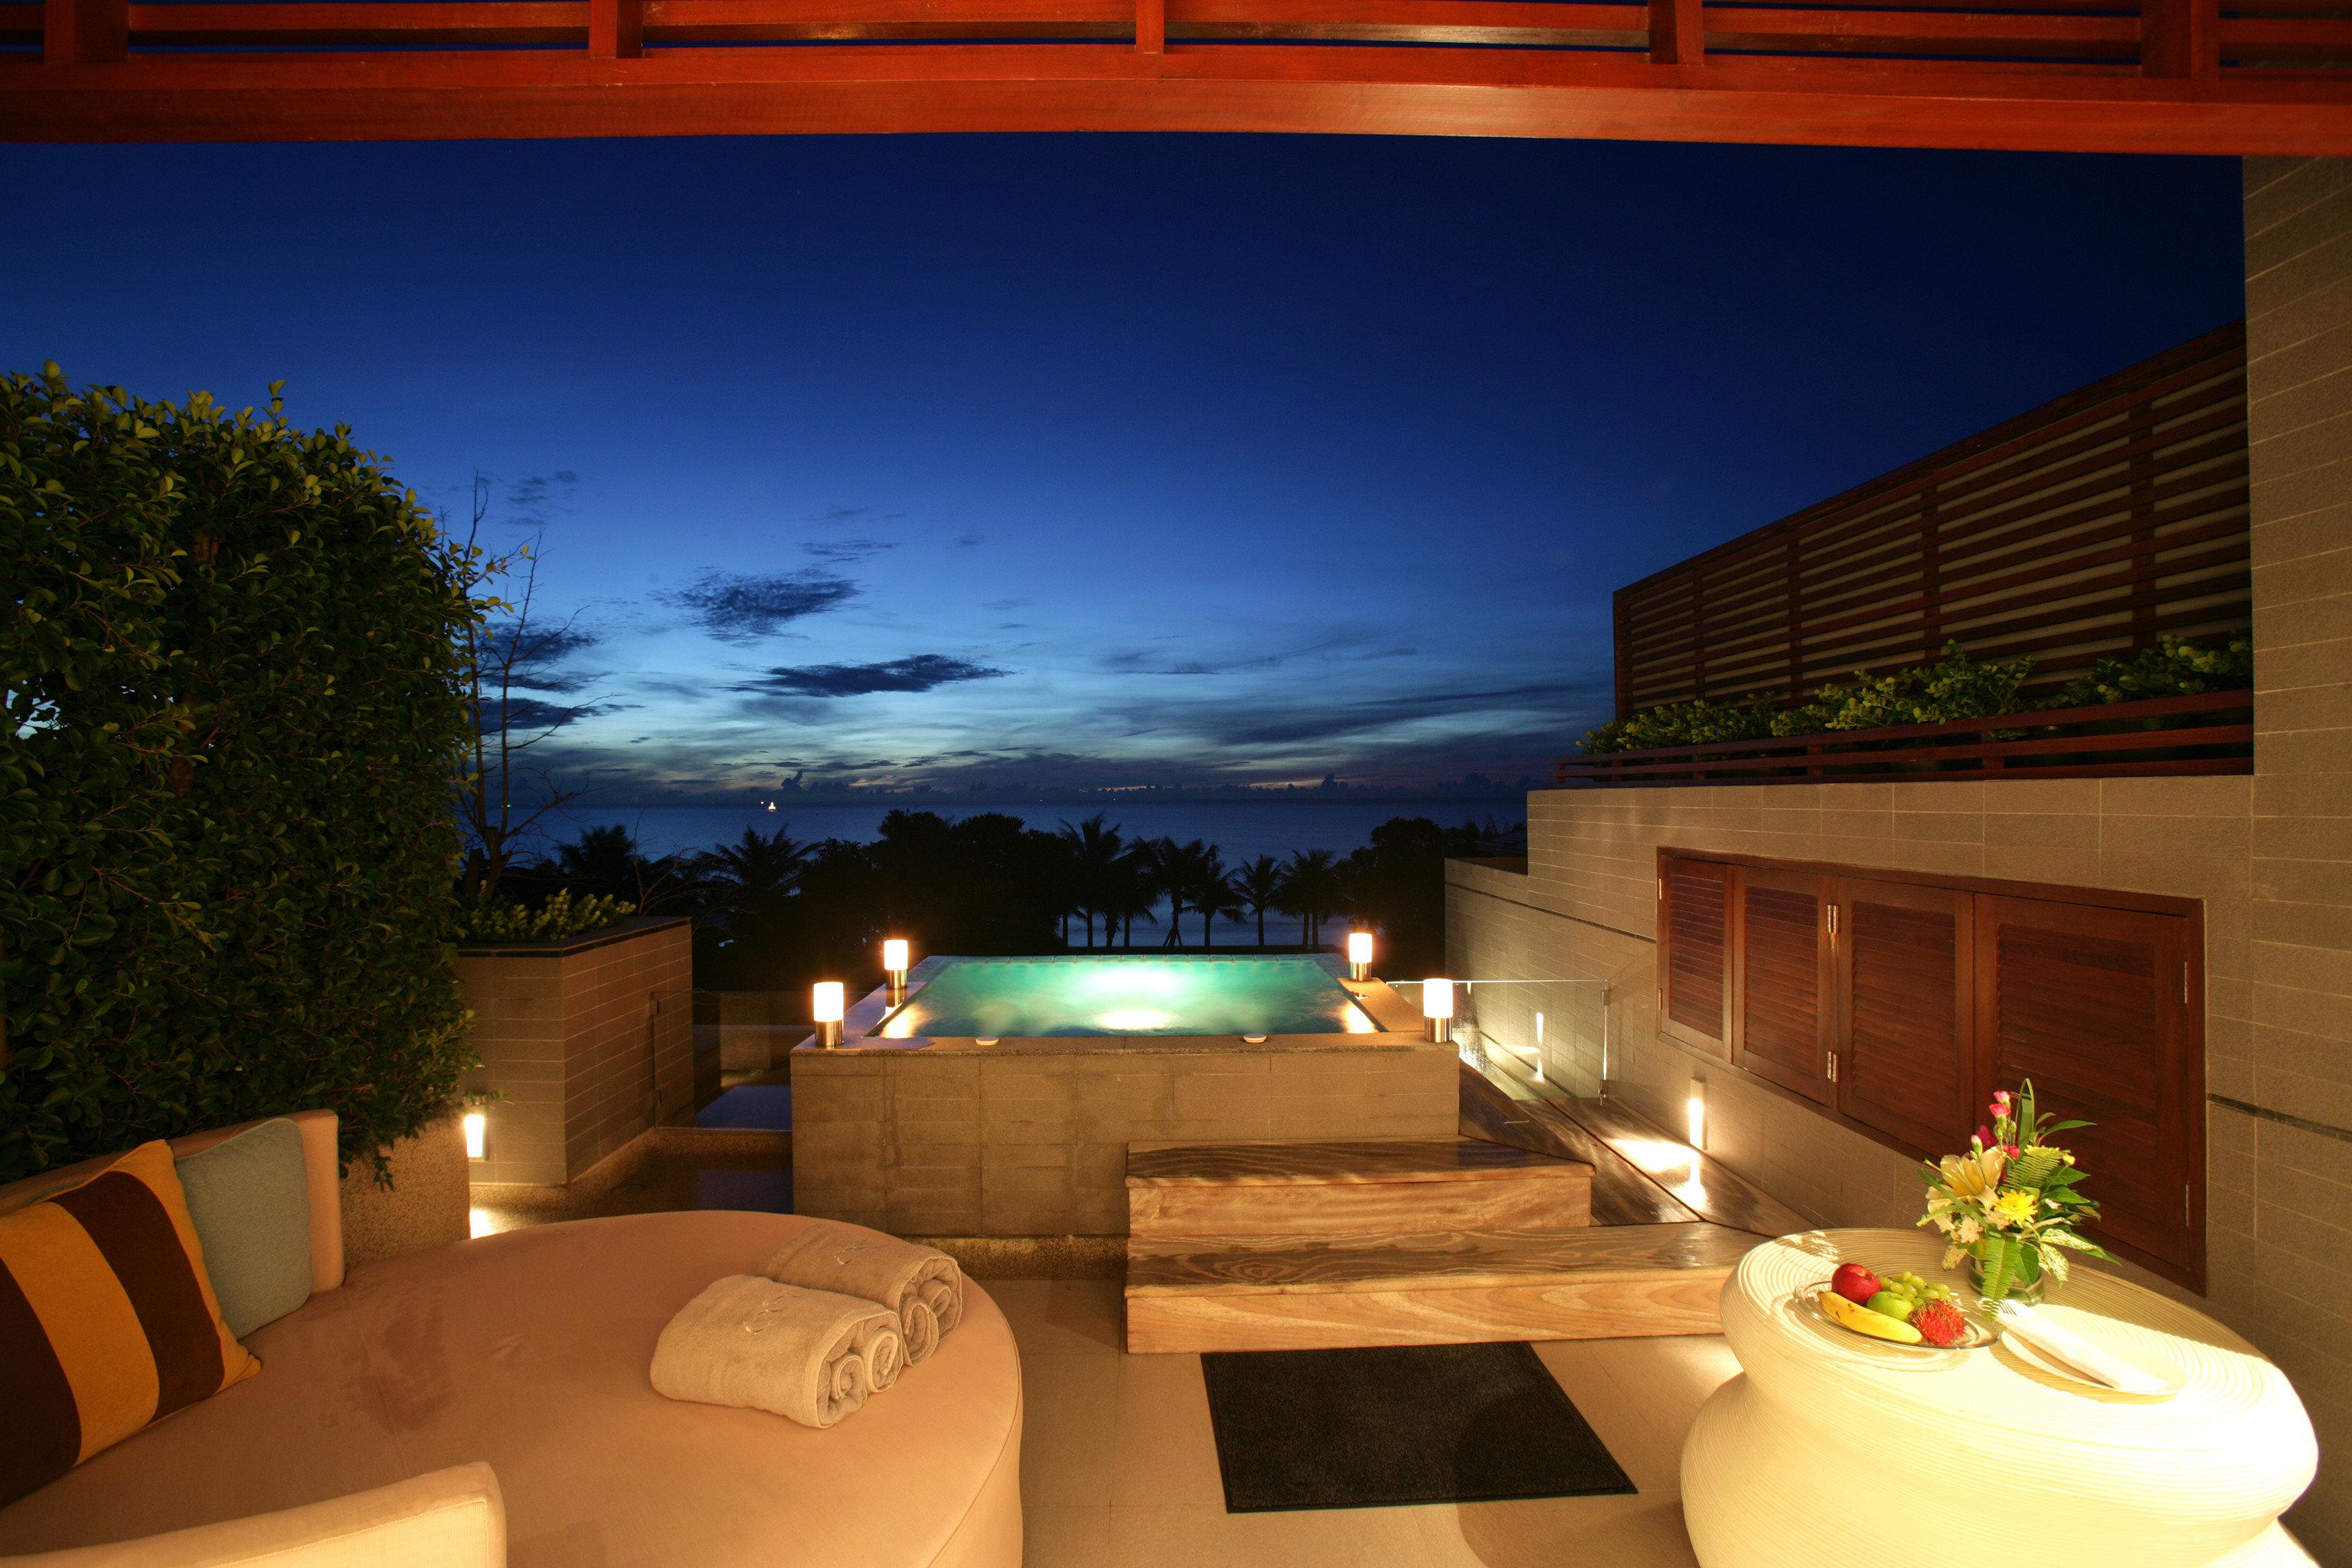 Balcony Beachfront Deck Elegant Honeymoon Hot tub/Jacuzzi Jungle Romance Romantic Tropical Waterfront house swimming pool home lighting